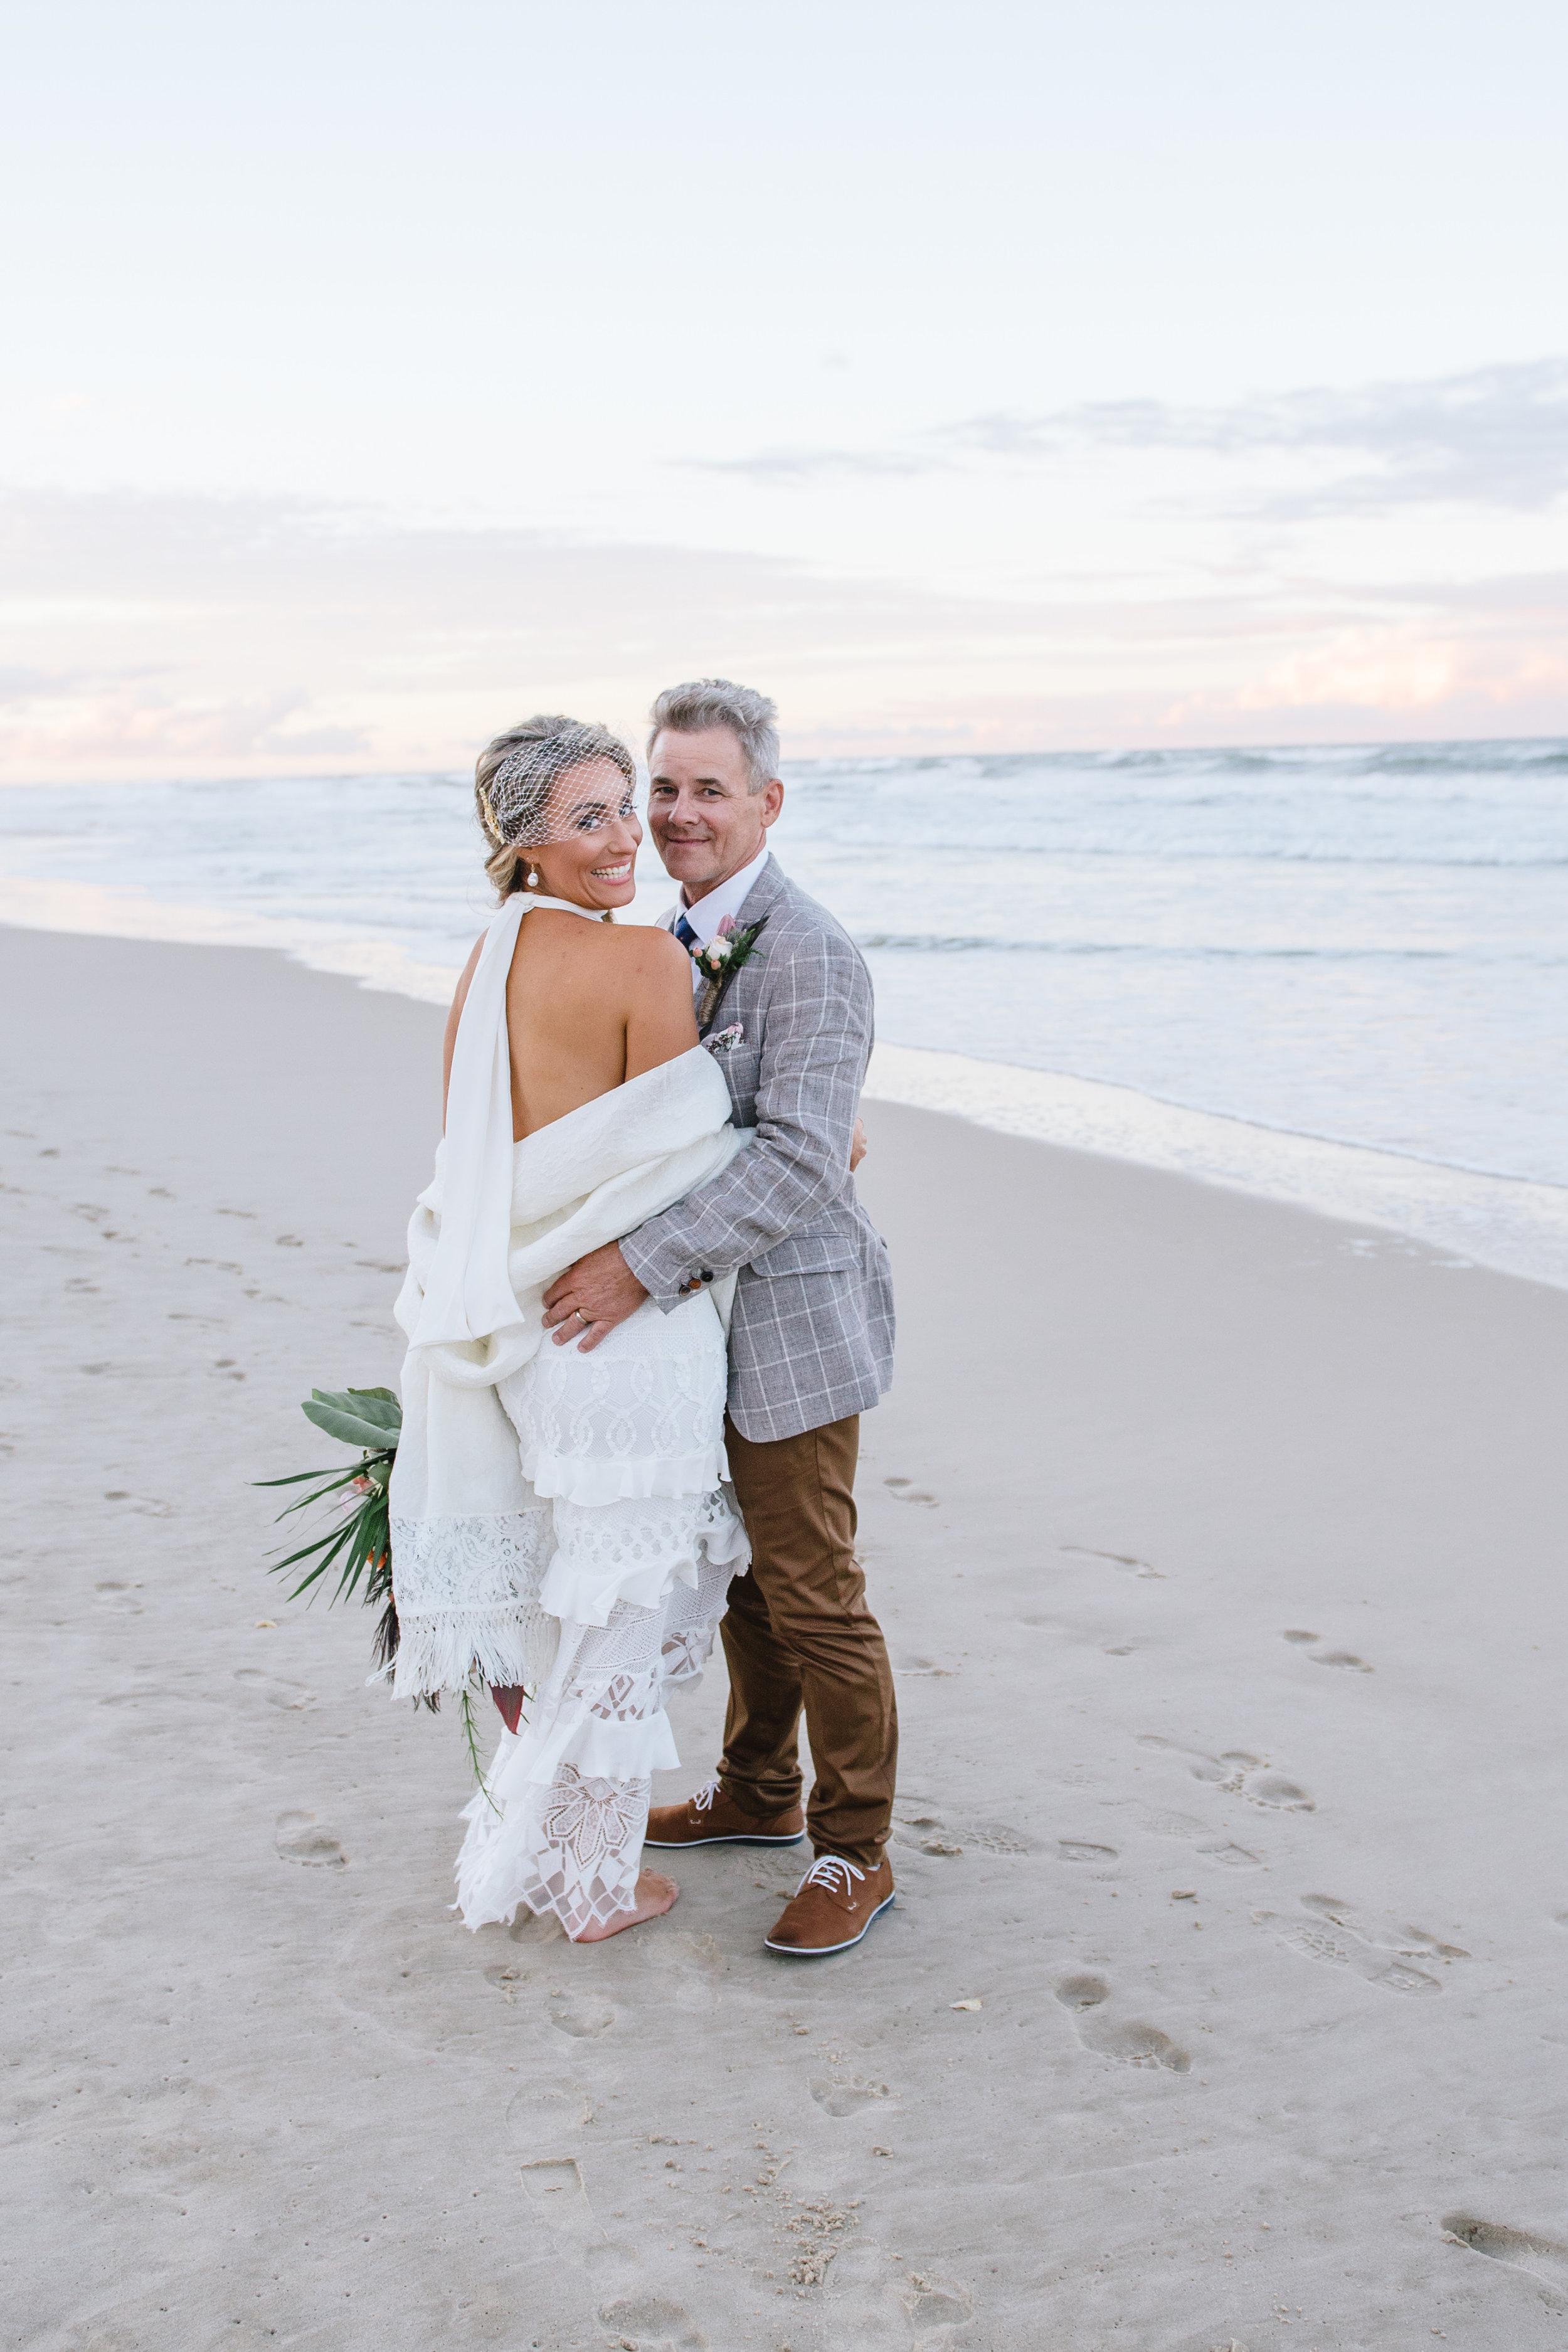 leah and cliff- skyla sage photography   wedding photographer, byron bay wedding and family photographer, tweed heads wedding and family photography-292.jpg